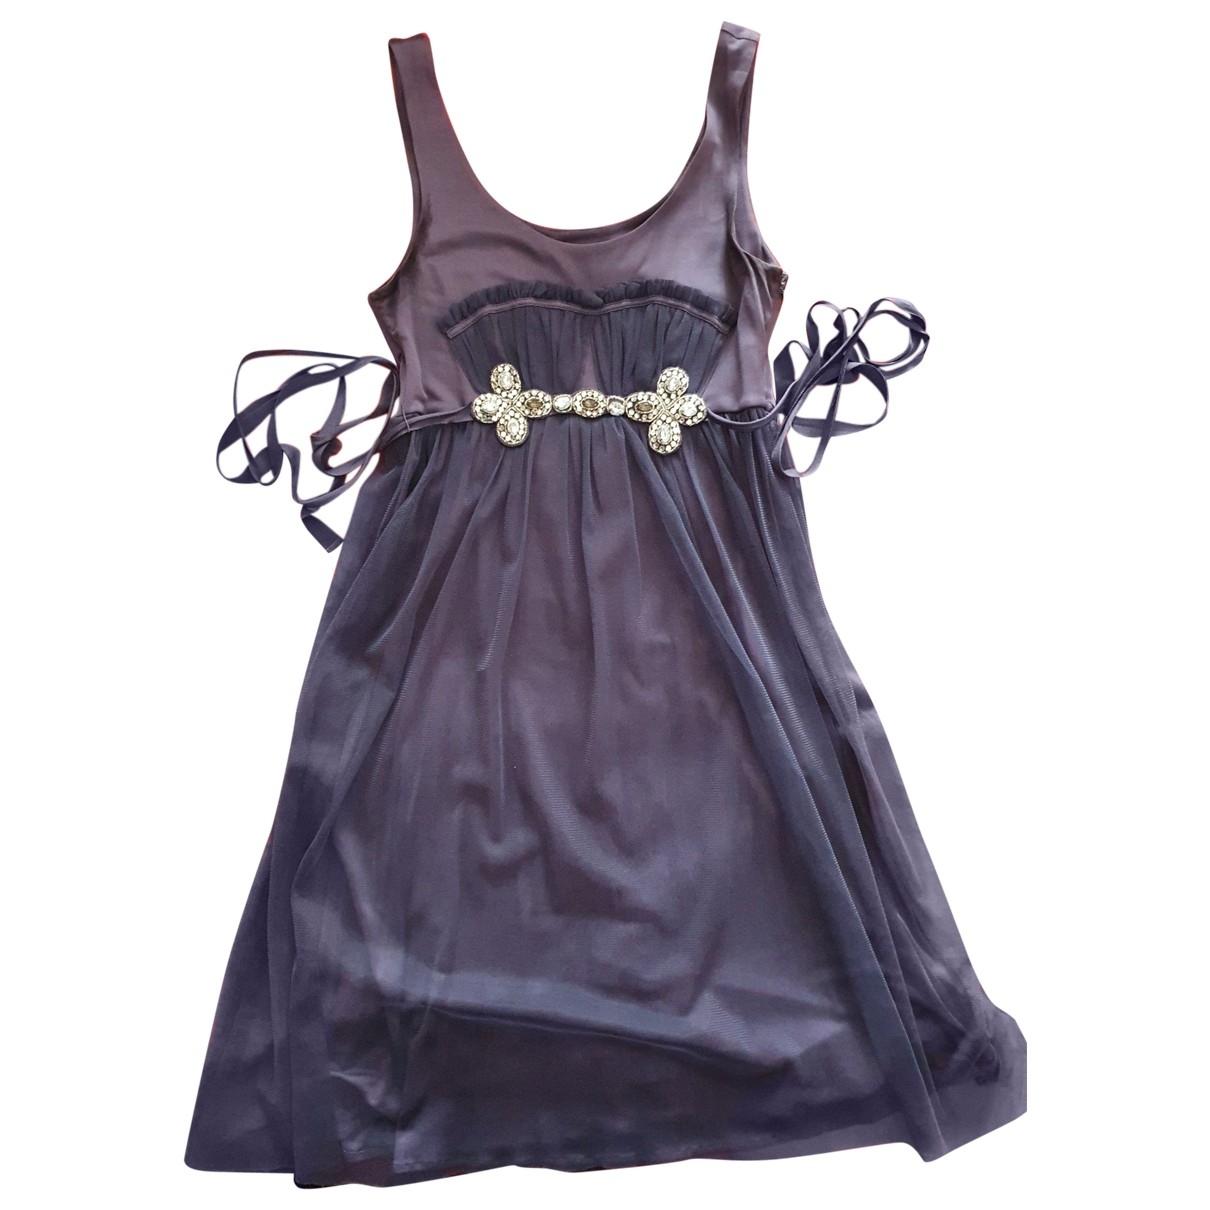 Emporio Armani \N Kleid in  Lila Seide